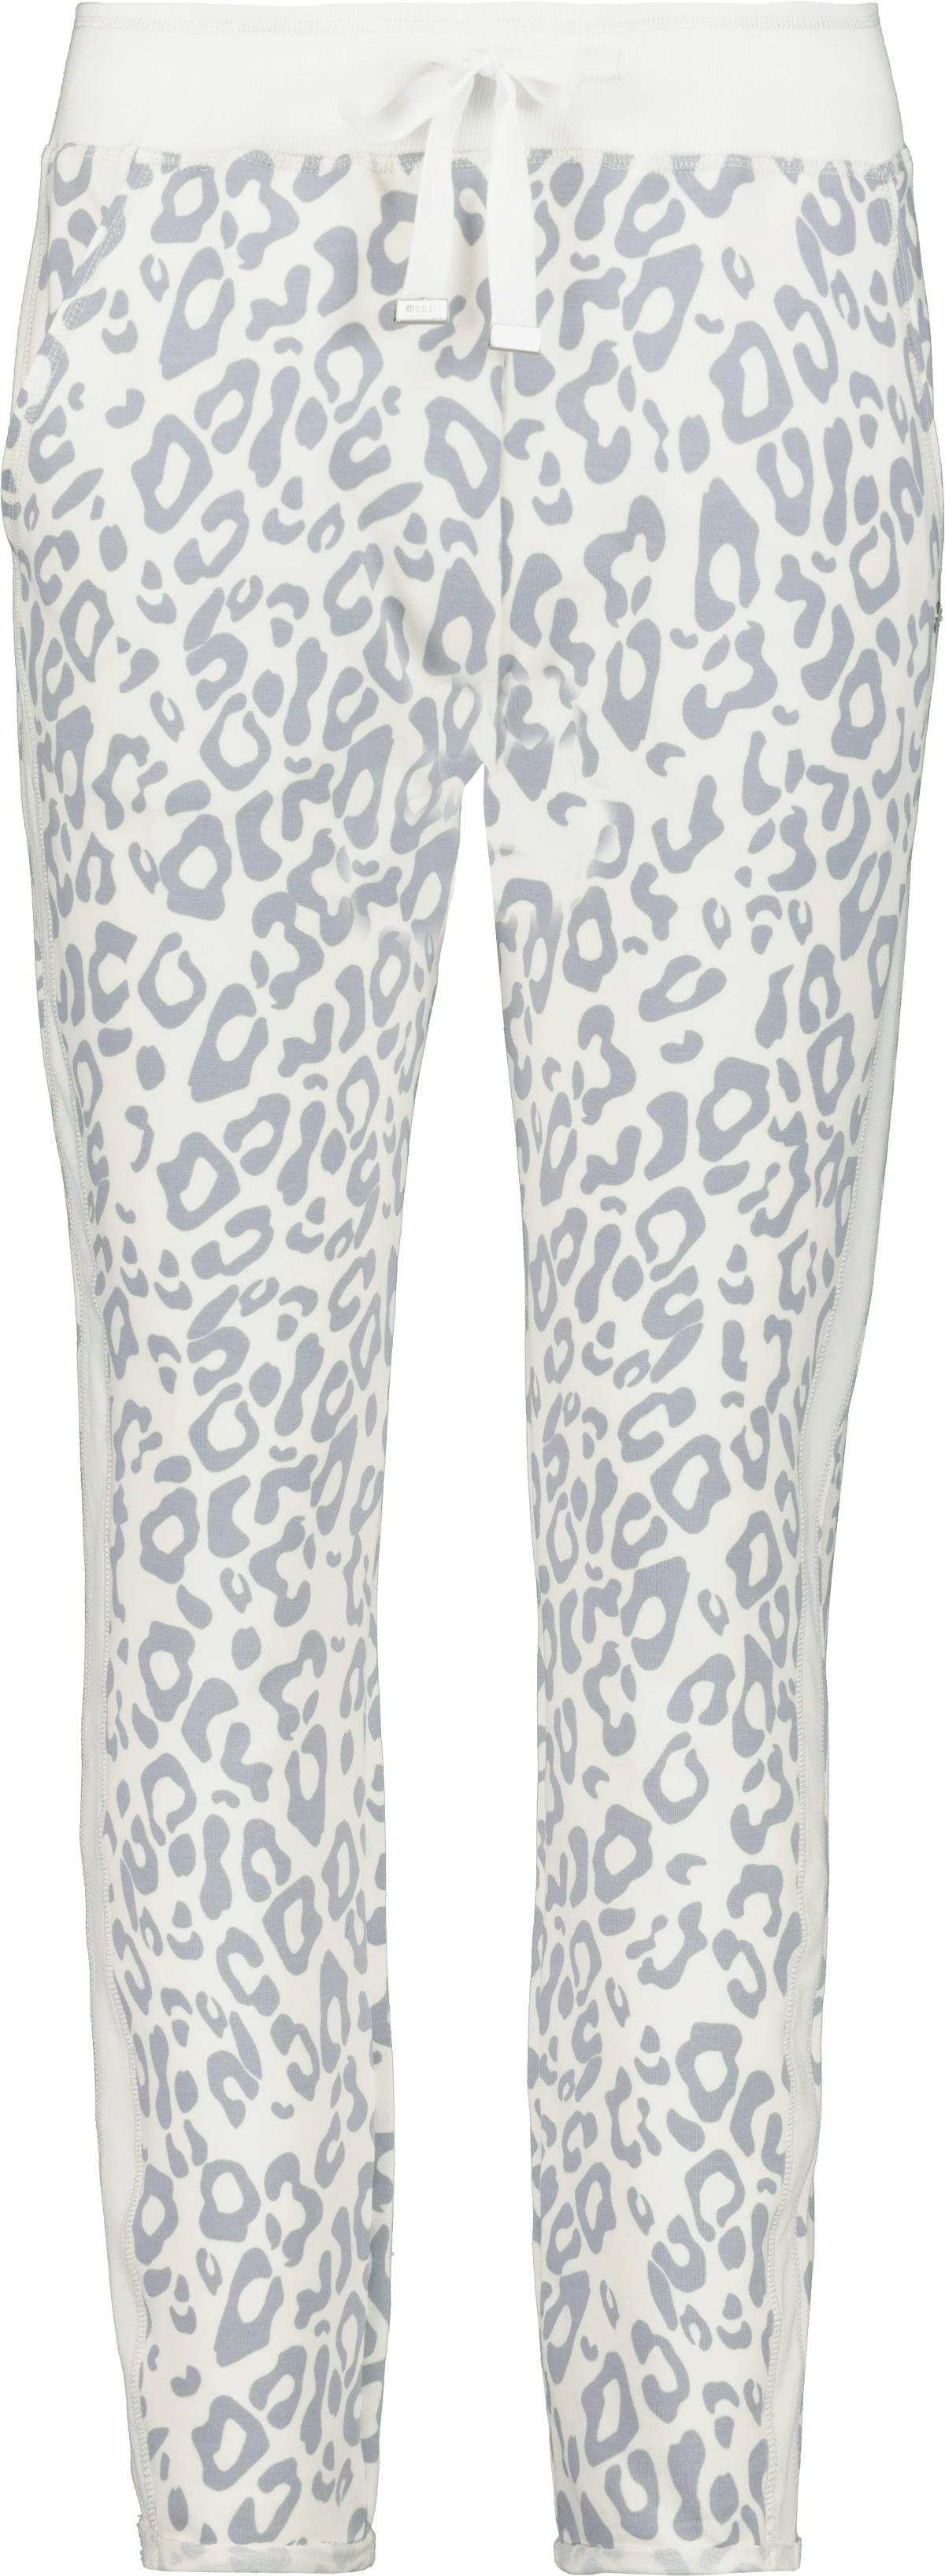 Monari Joggerhose mit Leopardenmuster grau